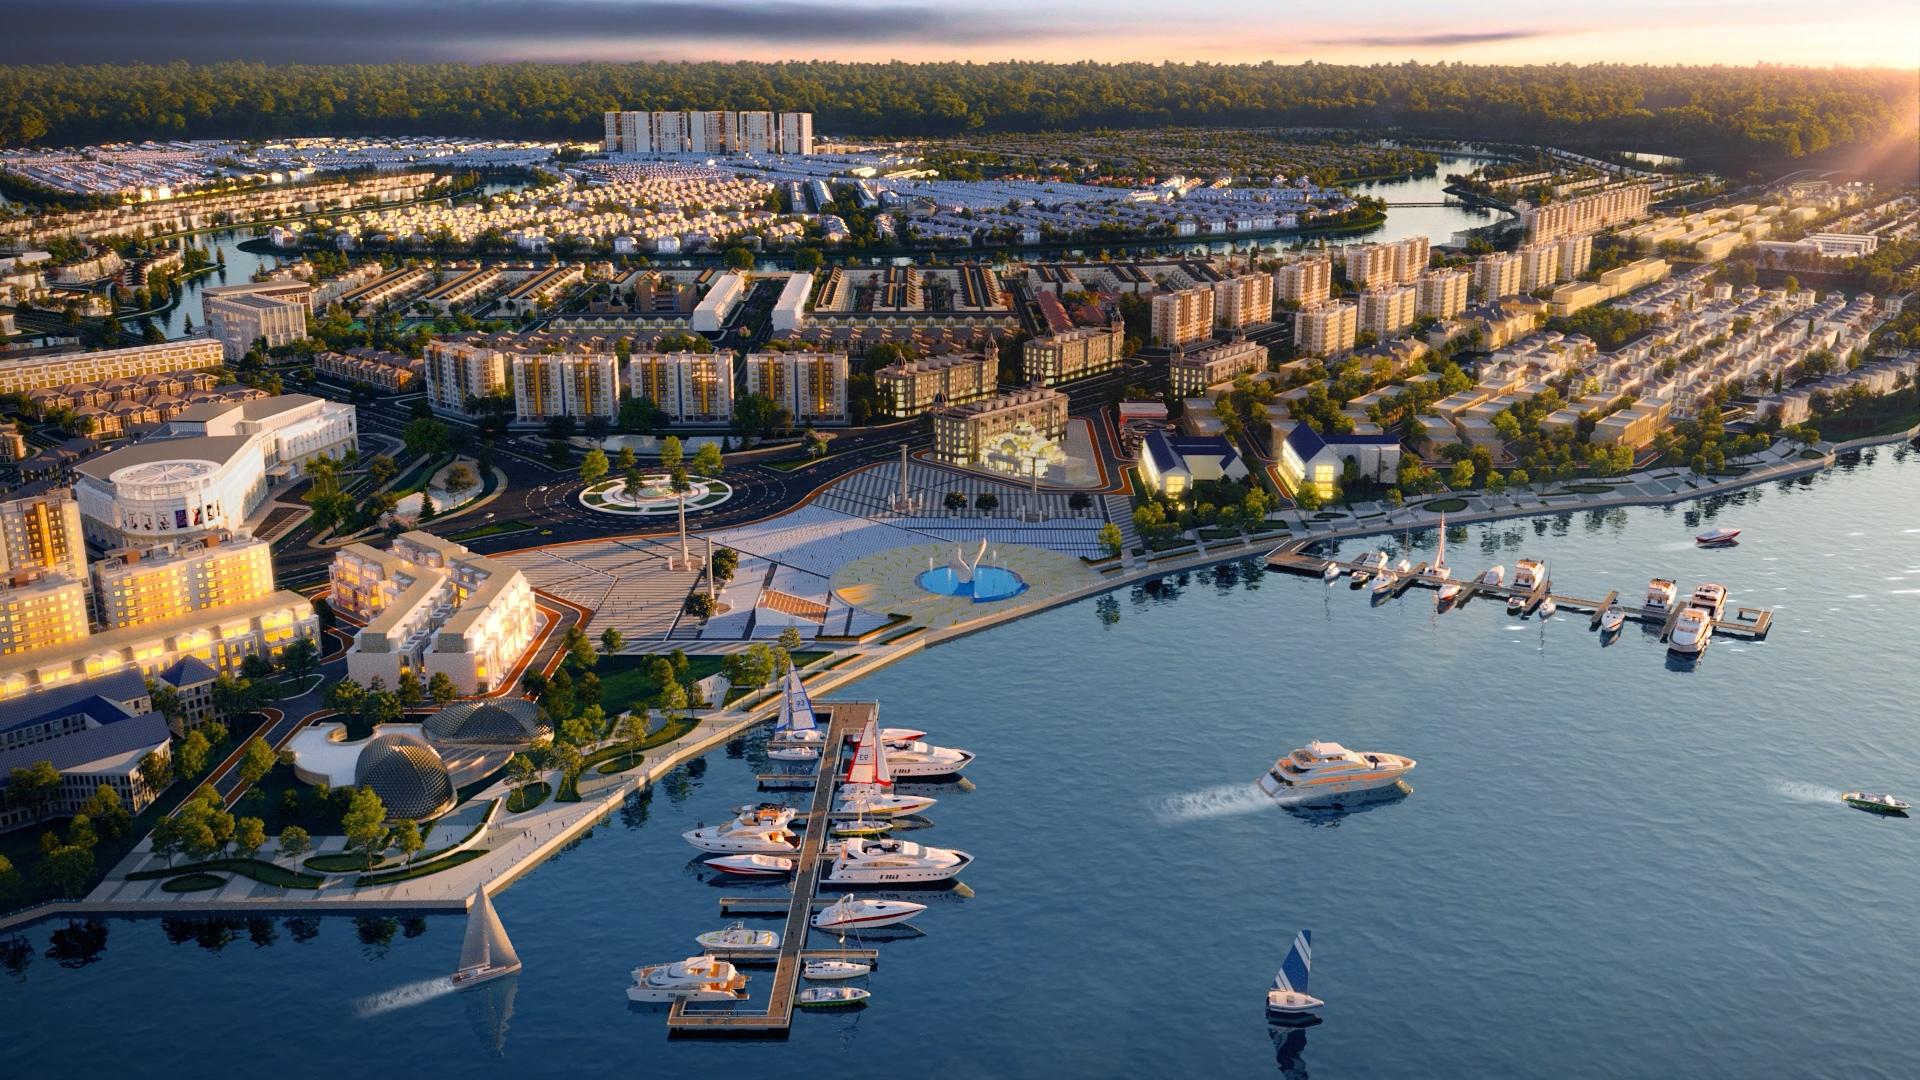 Novaland  , property  , real estate  , stocks  , bonds  , Singapore  , investment  ,